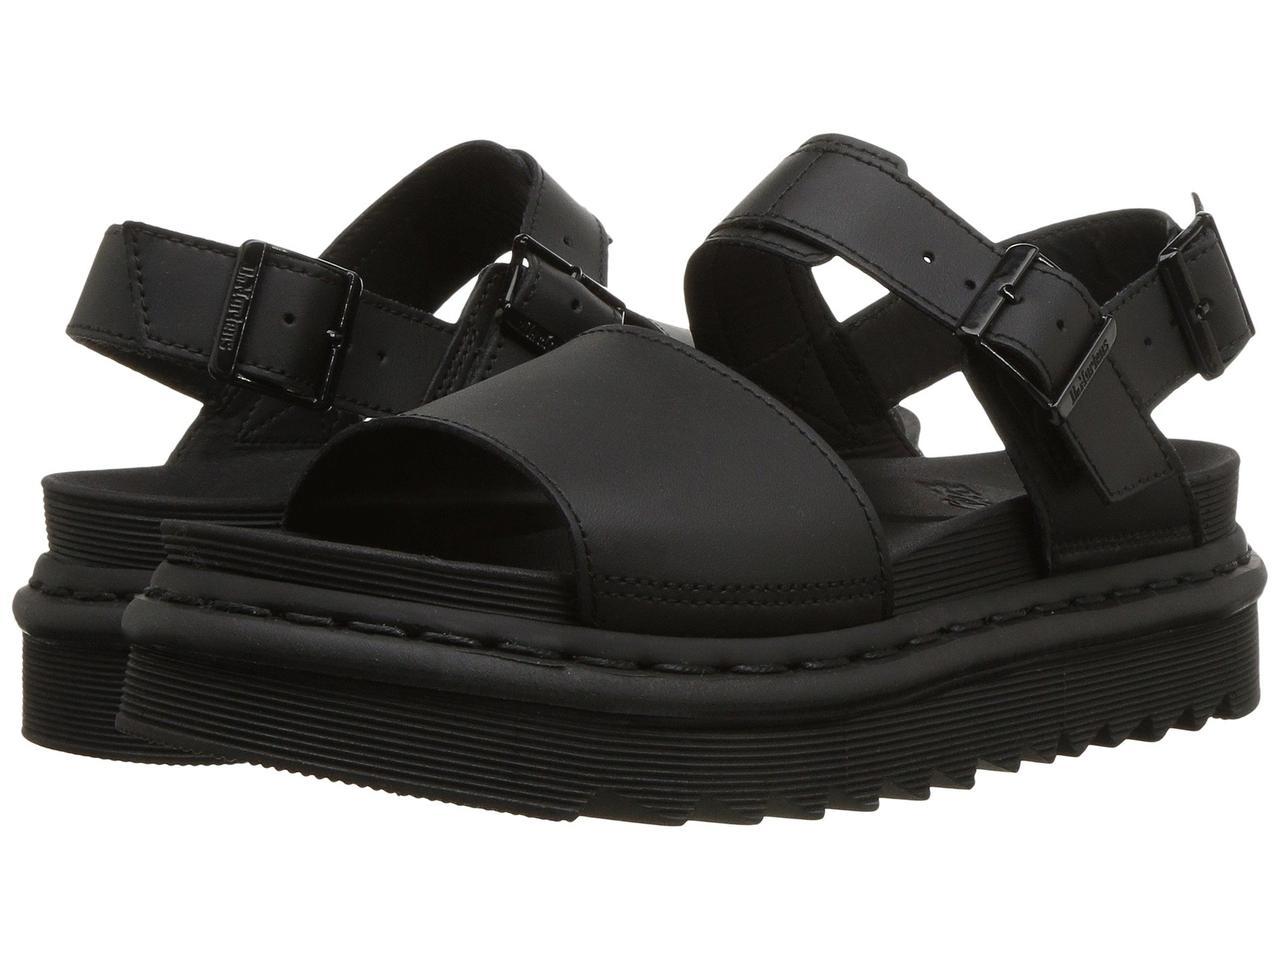 Сандали/Вьетнамки (Оригинал) Dr. Martens Voss Black Hydro Leather